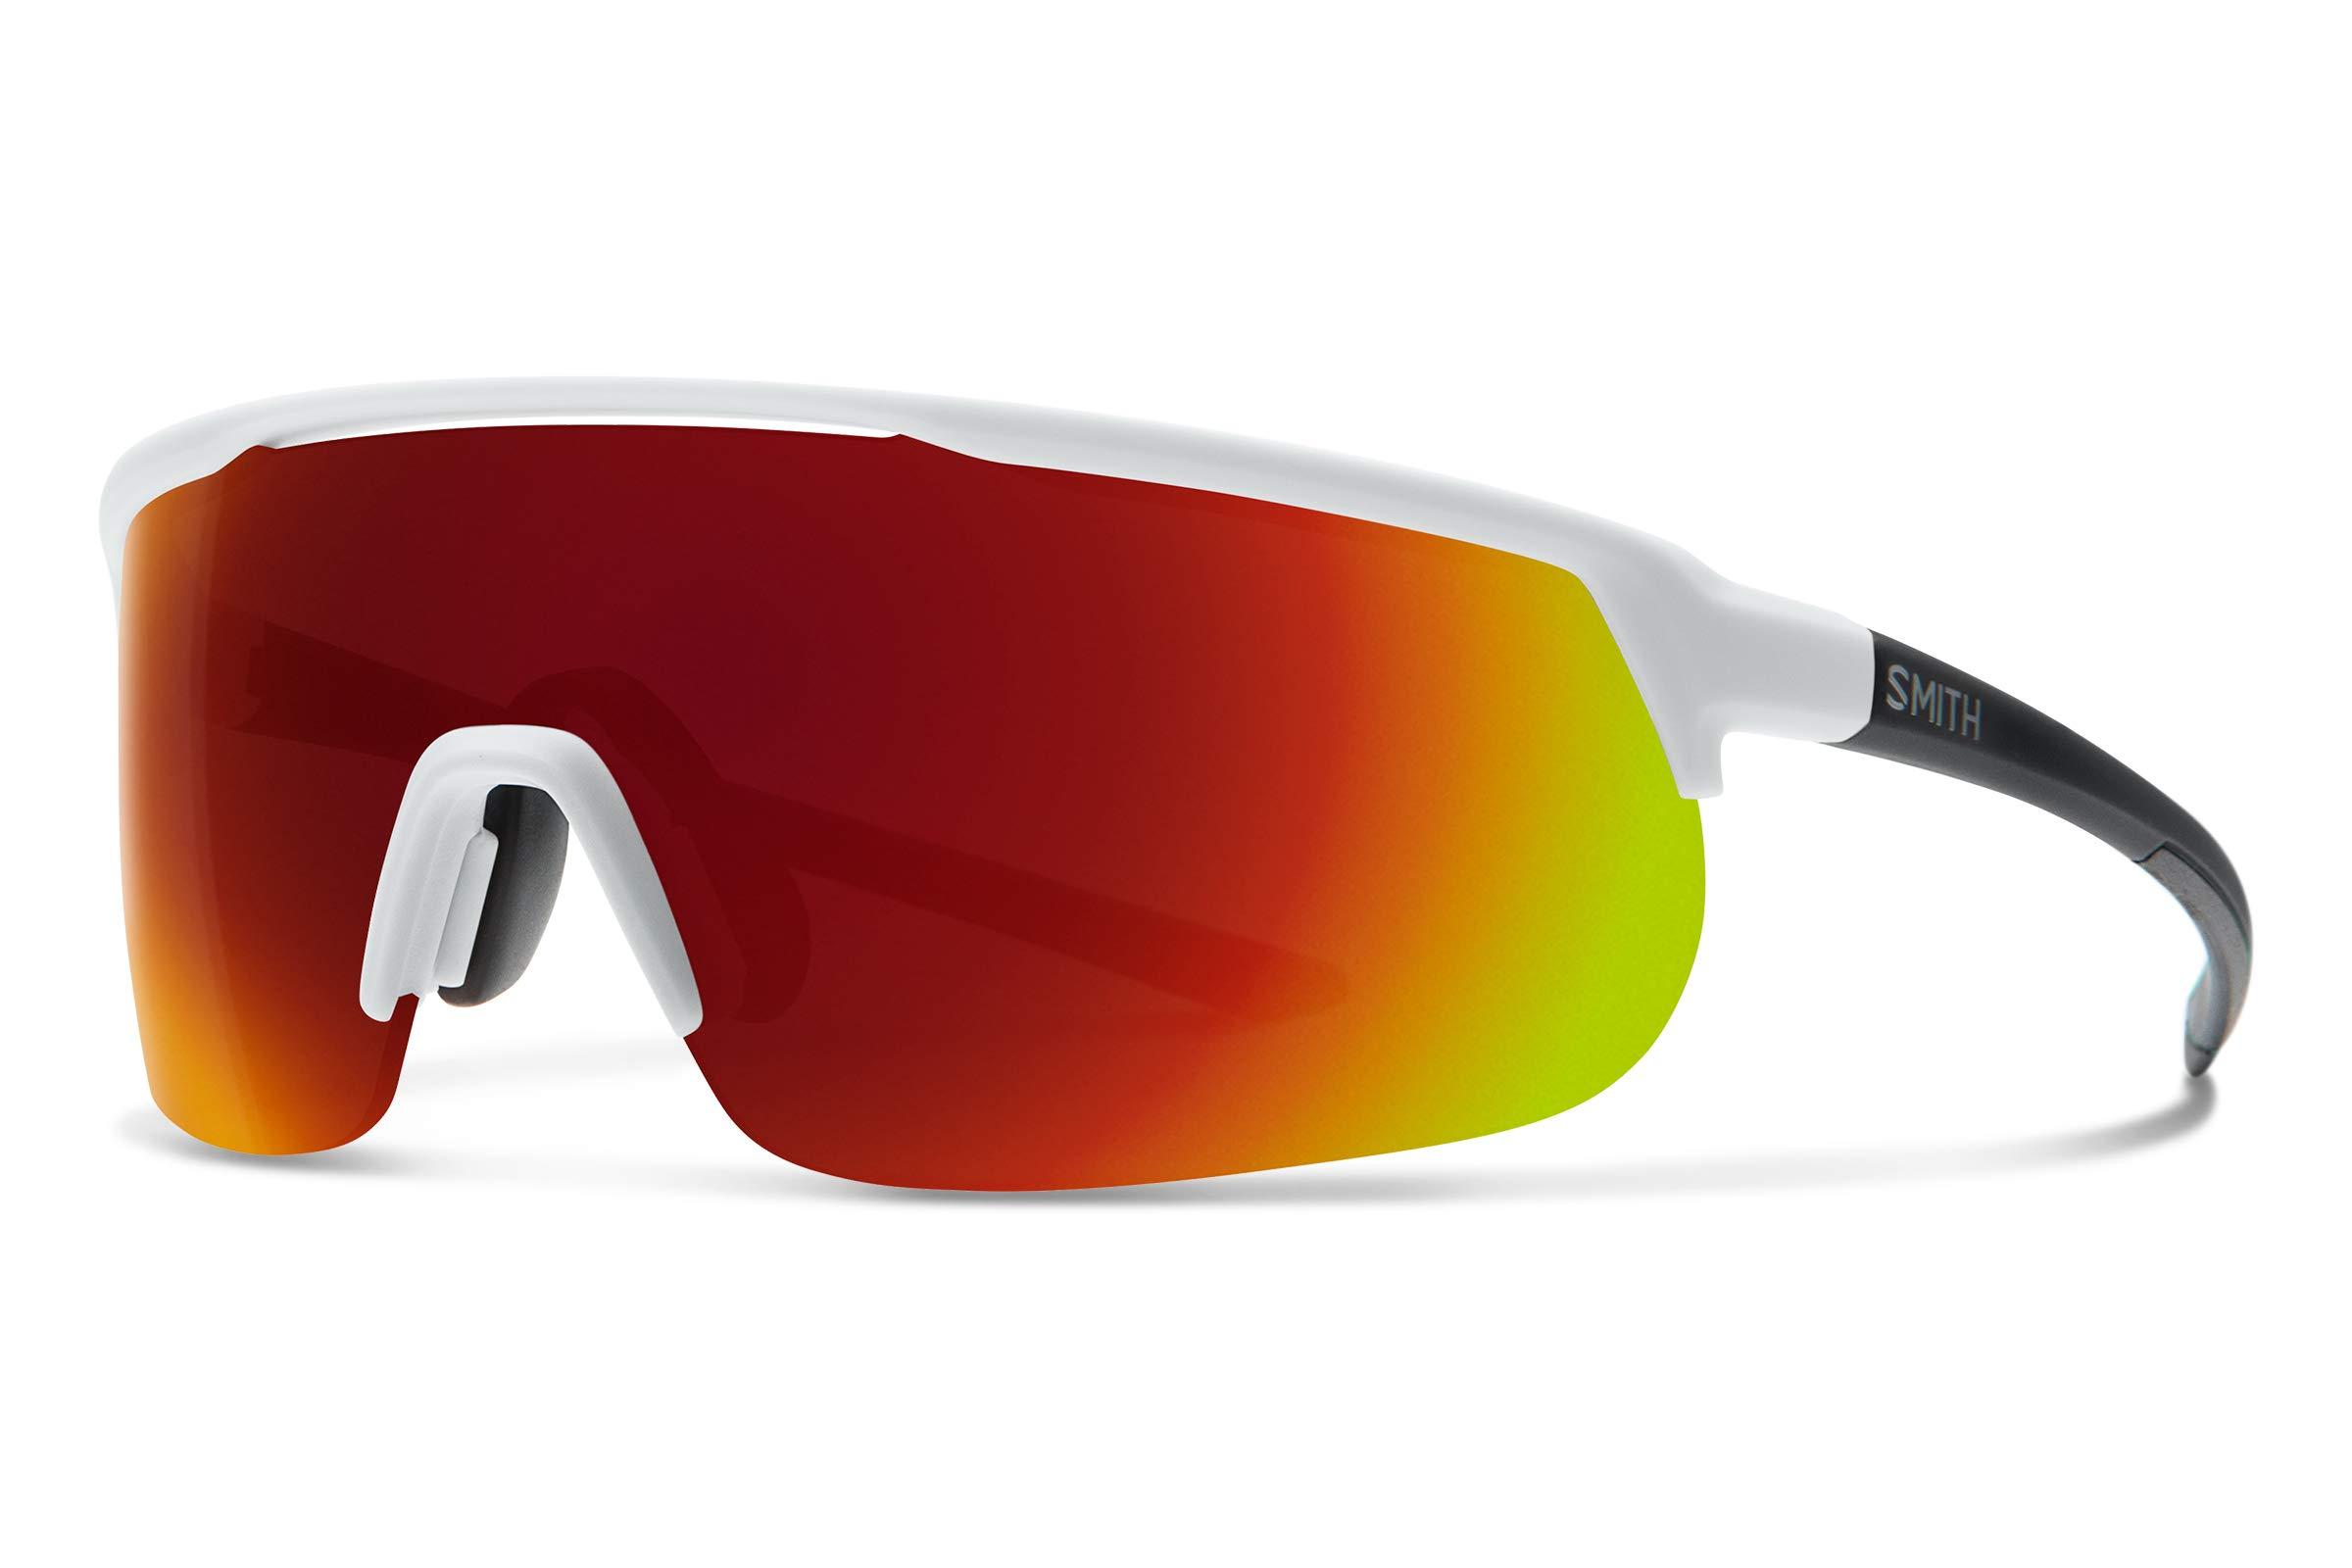 Smith Track Stand Chromapop Sunglasses, Matte White, Chromapop Sun Red Mirror/Contrast Rose